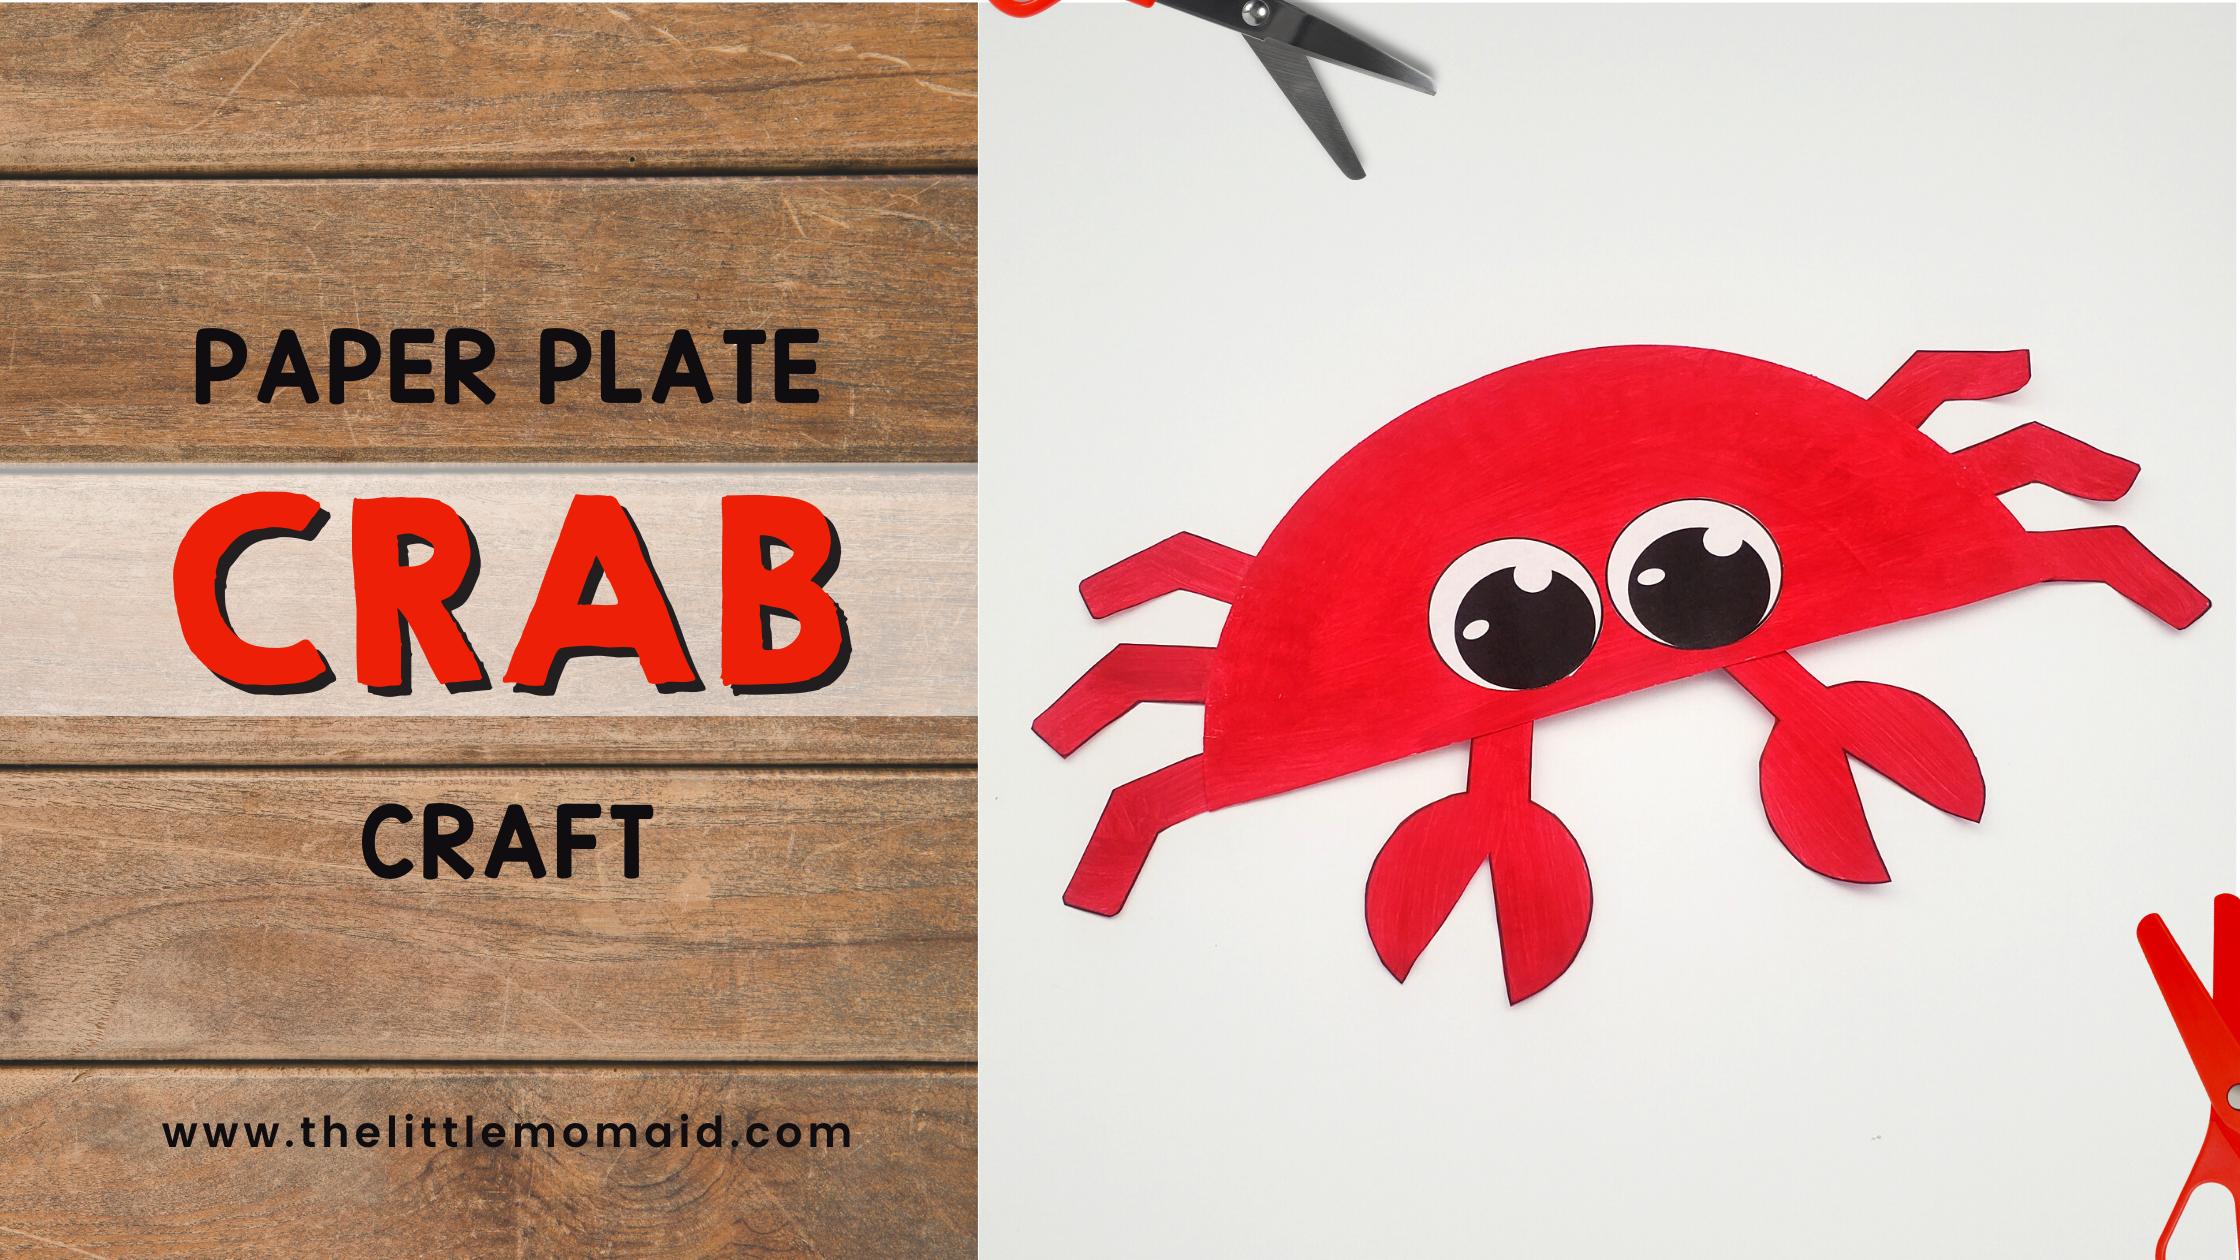 Paper plate crab craft art activity